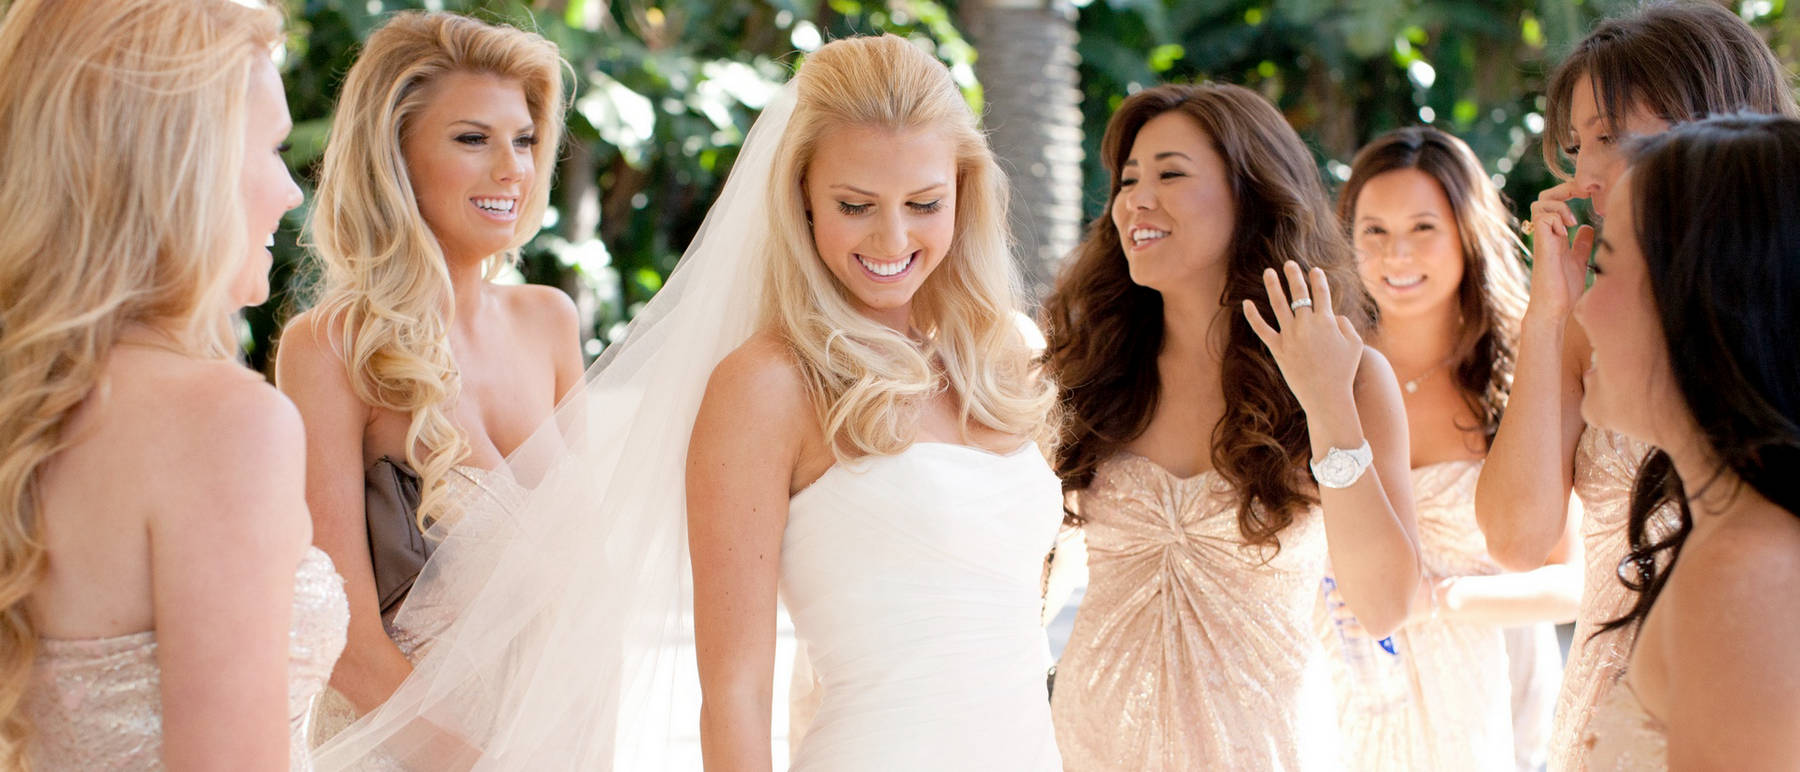 johnandjoseph-wedding-photographer-hz-slider-304